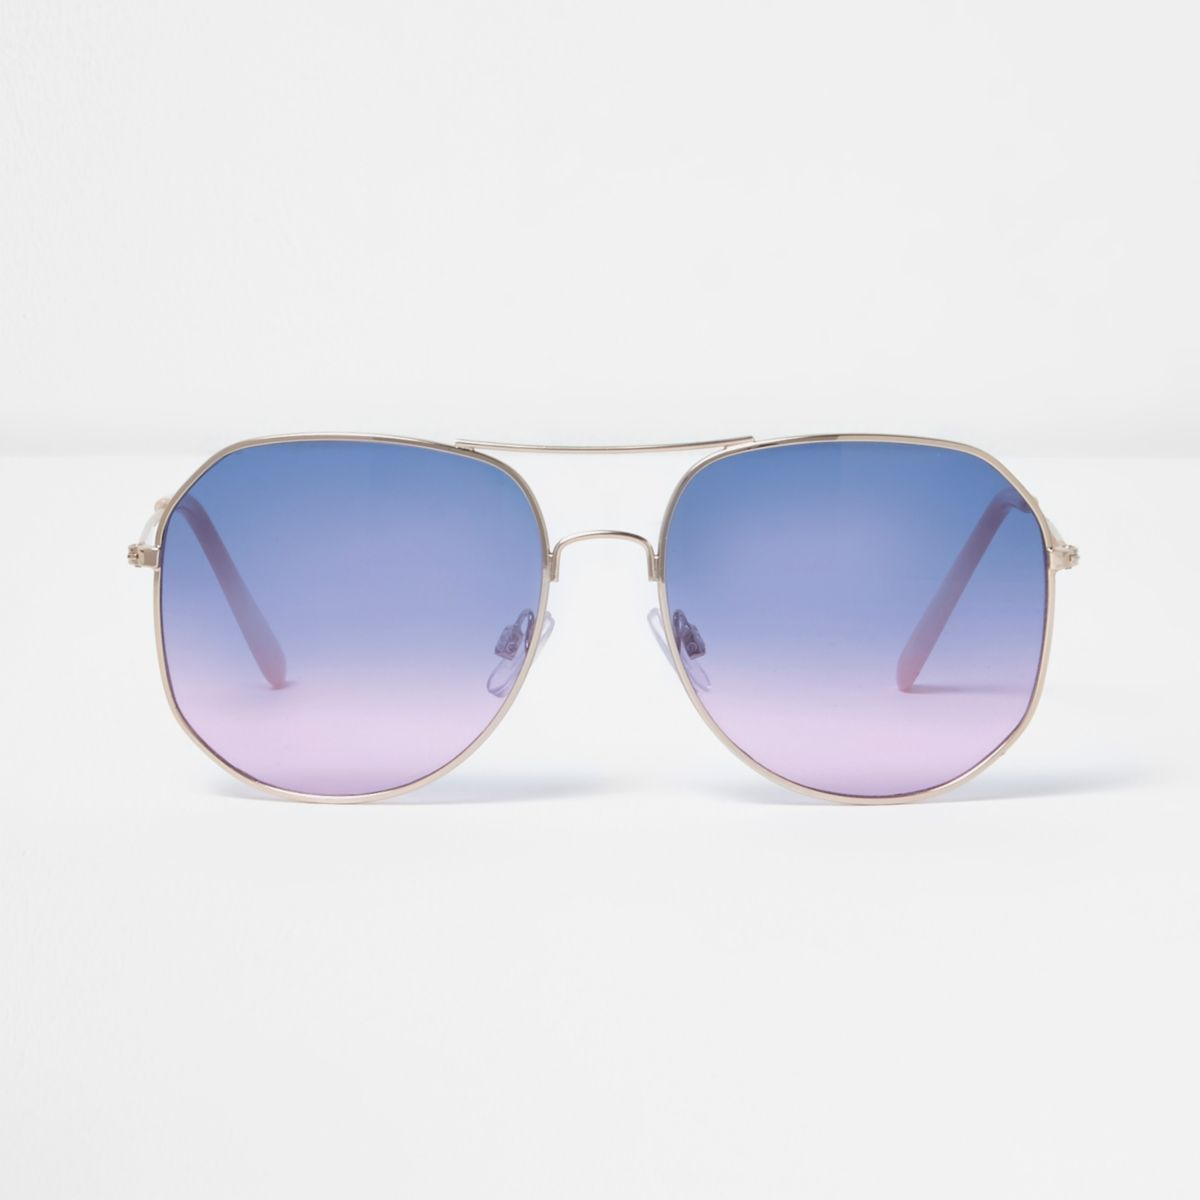 Gold tone ocean lens aviator sunglasses